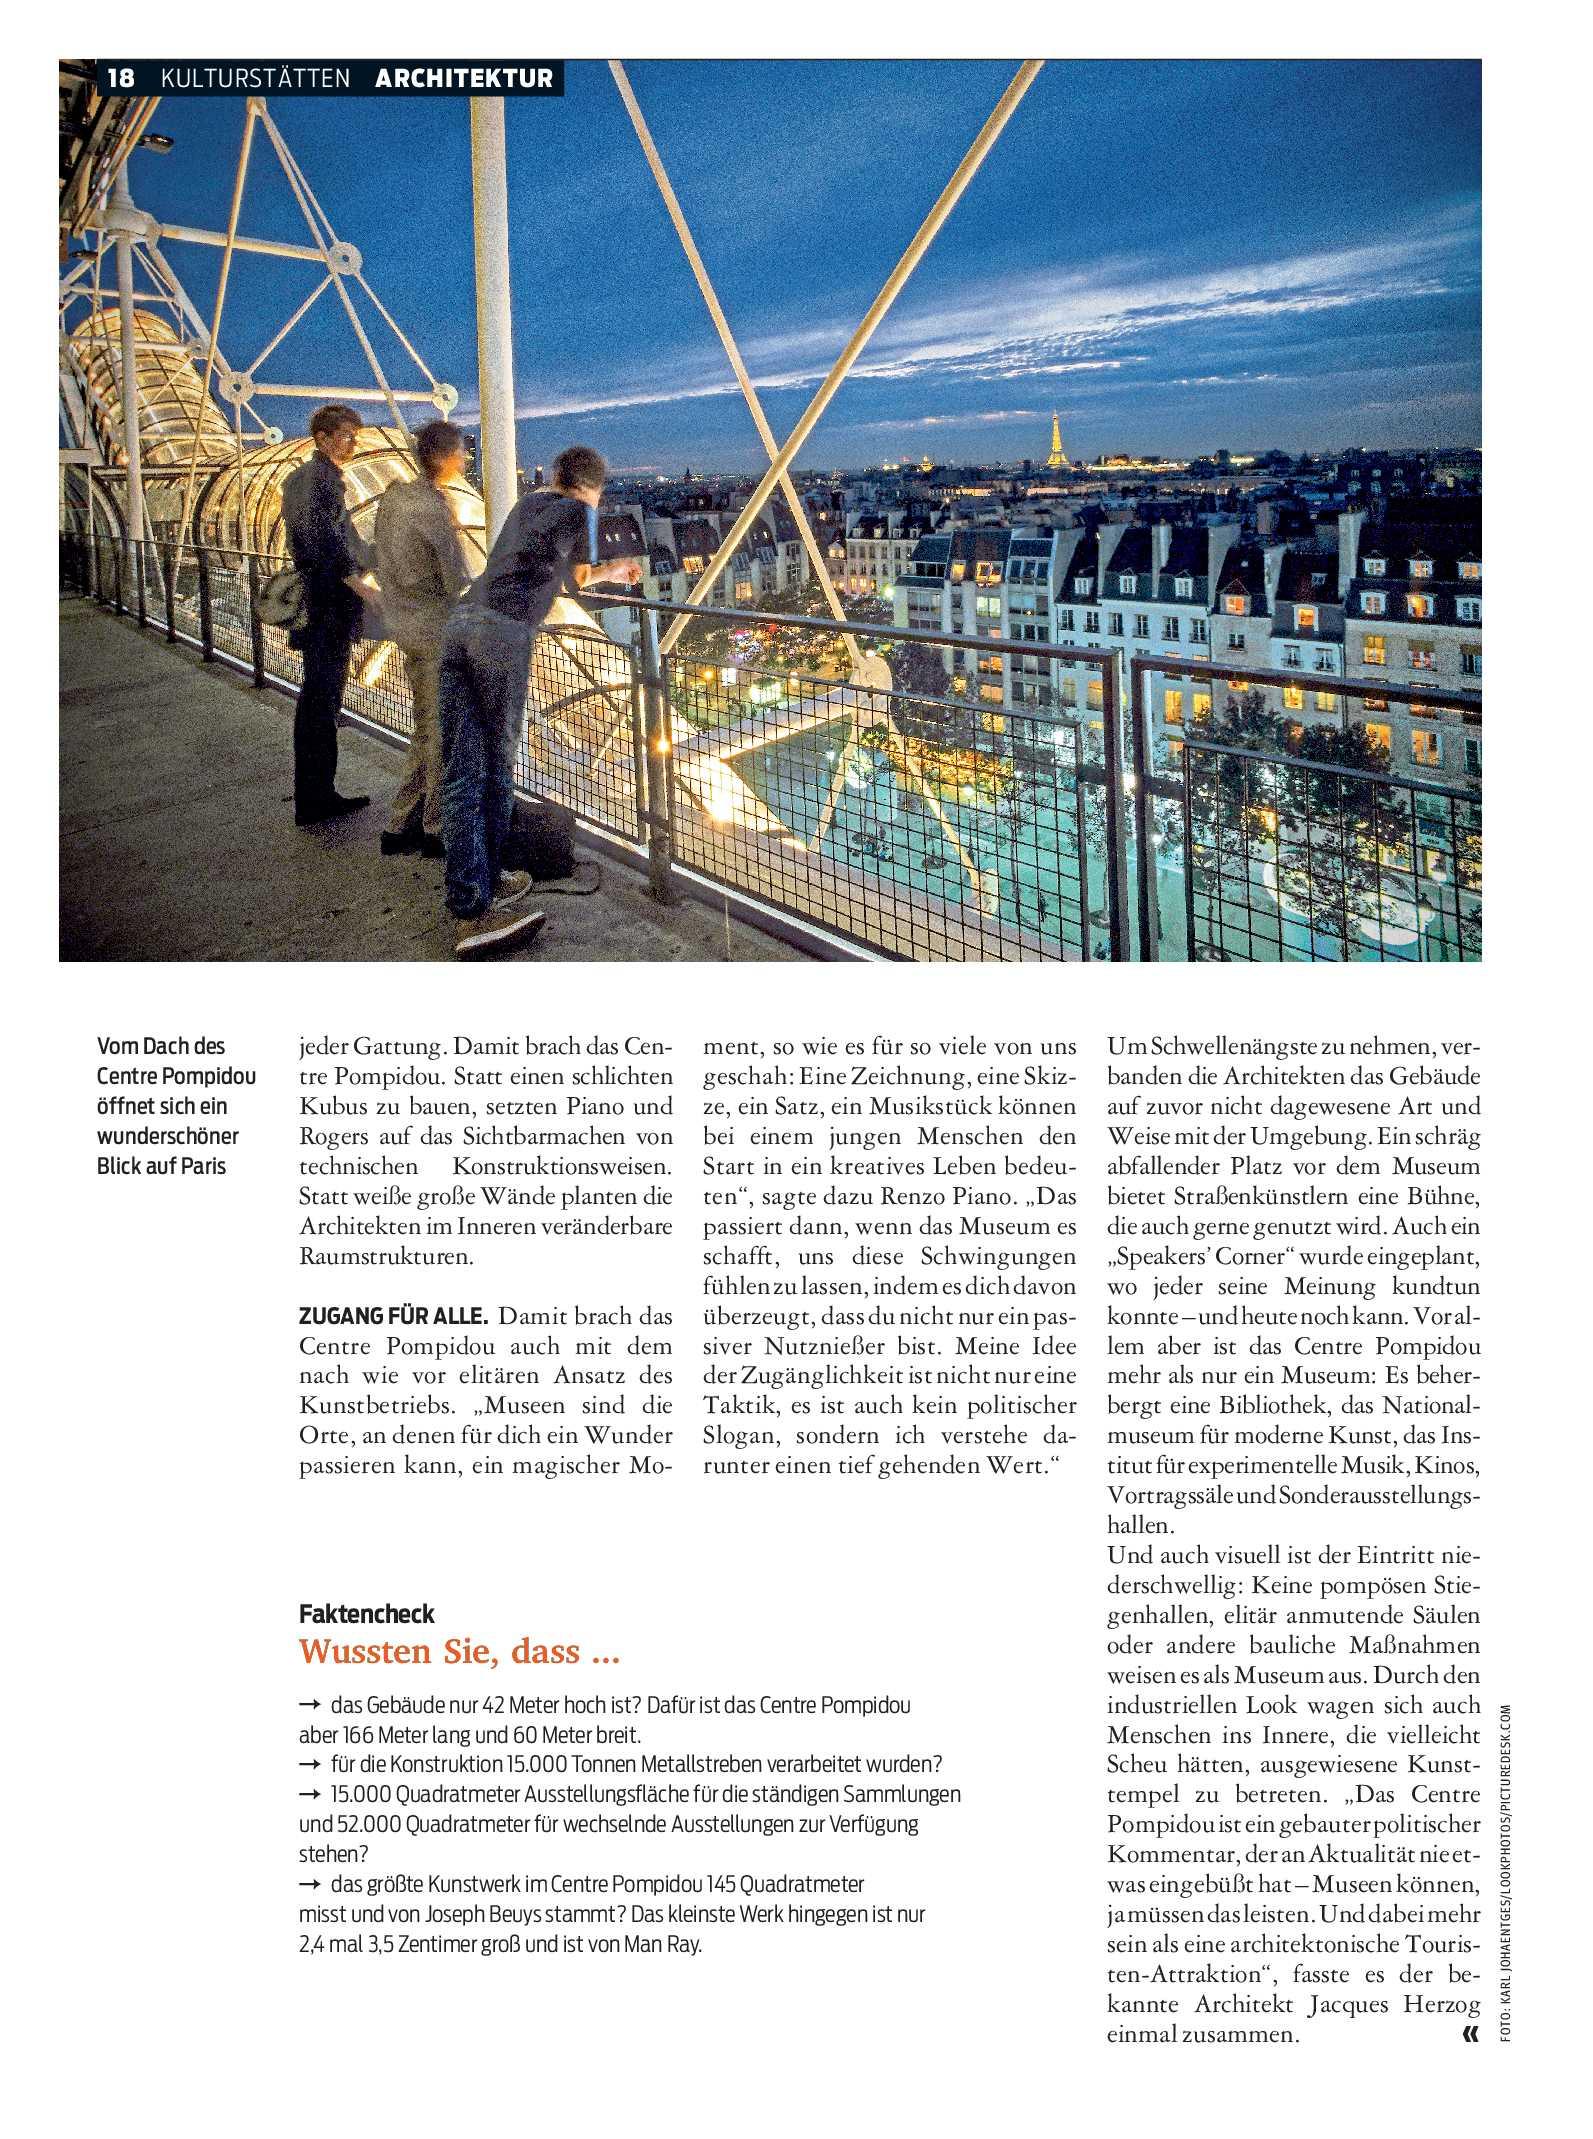 public/epaper/imported/20200930/kurier/magazin/magazin_20200930_018.jpg